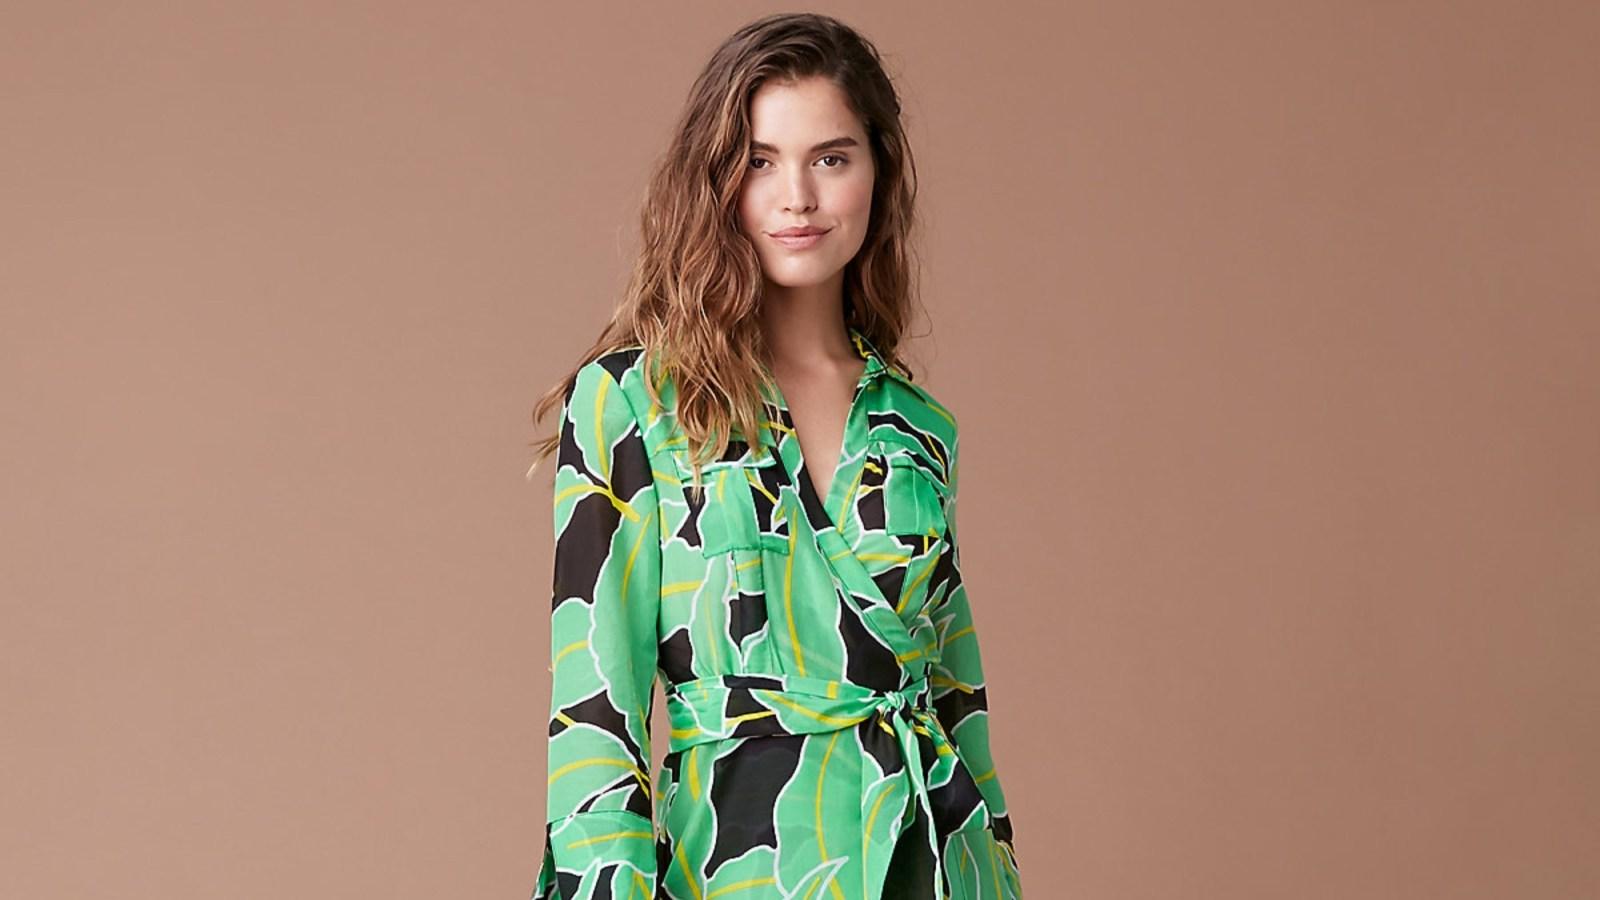 DVF Is Having a Major Sale on Wrap Dresses Shop Our 5 Favorites 1600x900